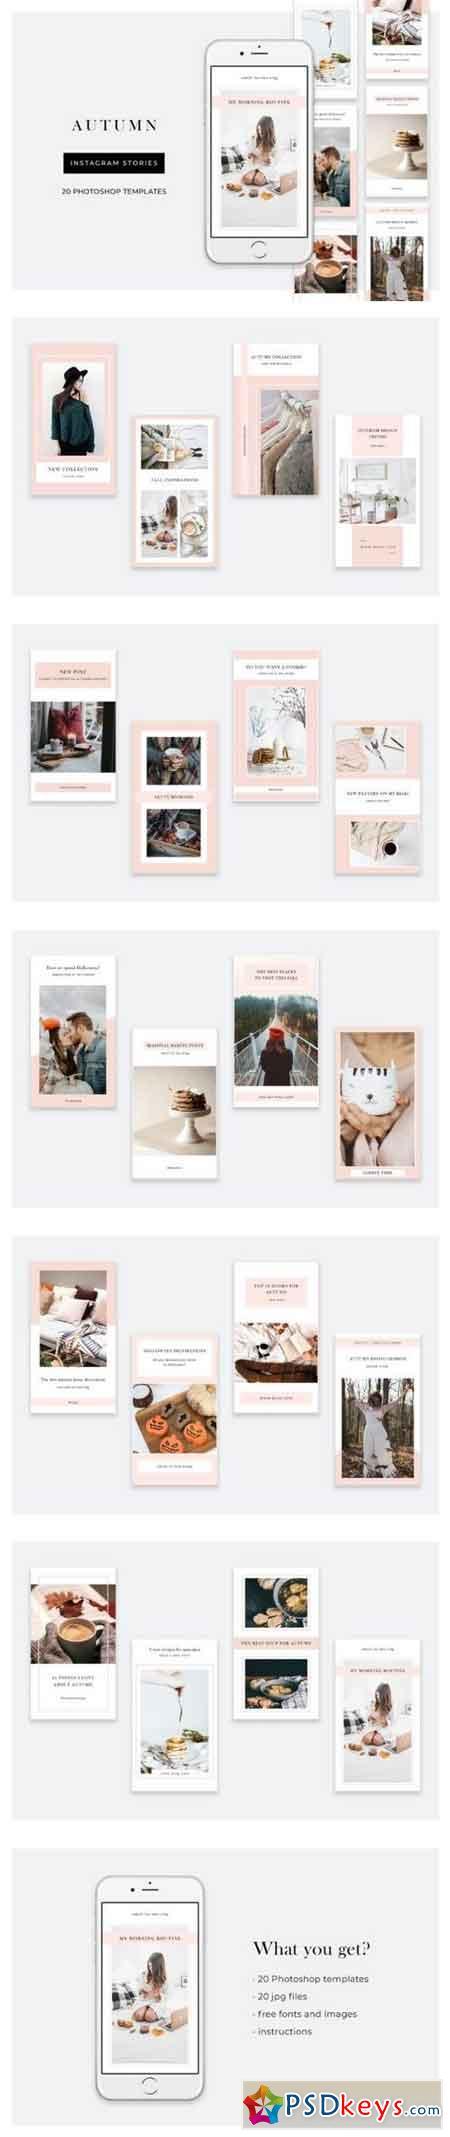 Autumn Instagram Stories – 20 Photoshop templates 772671